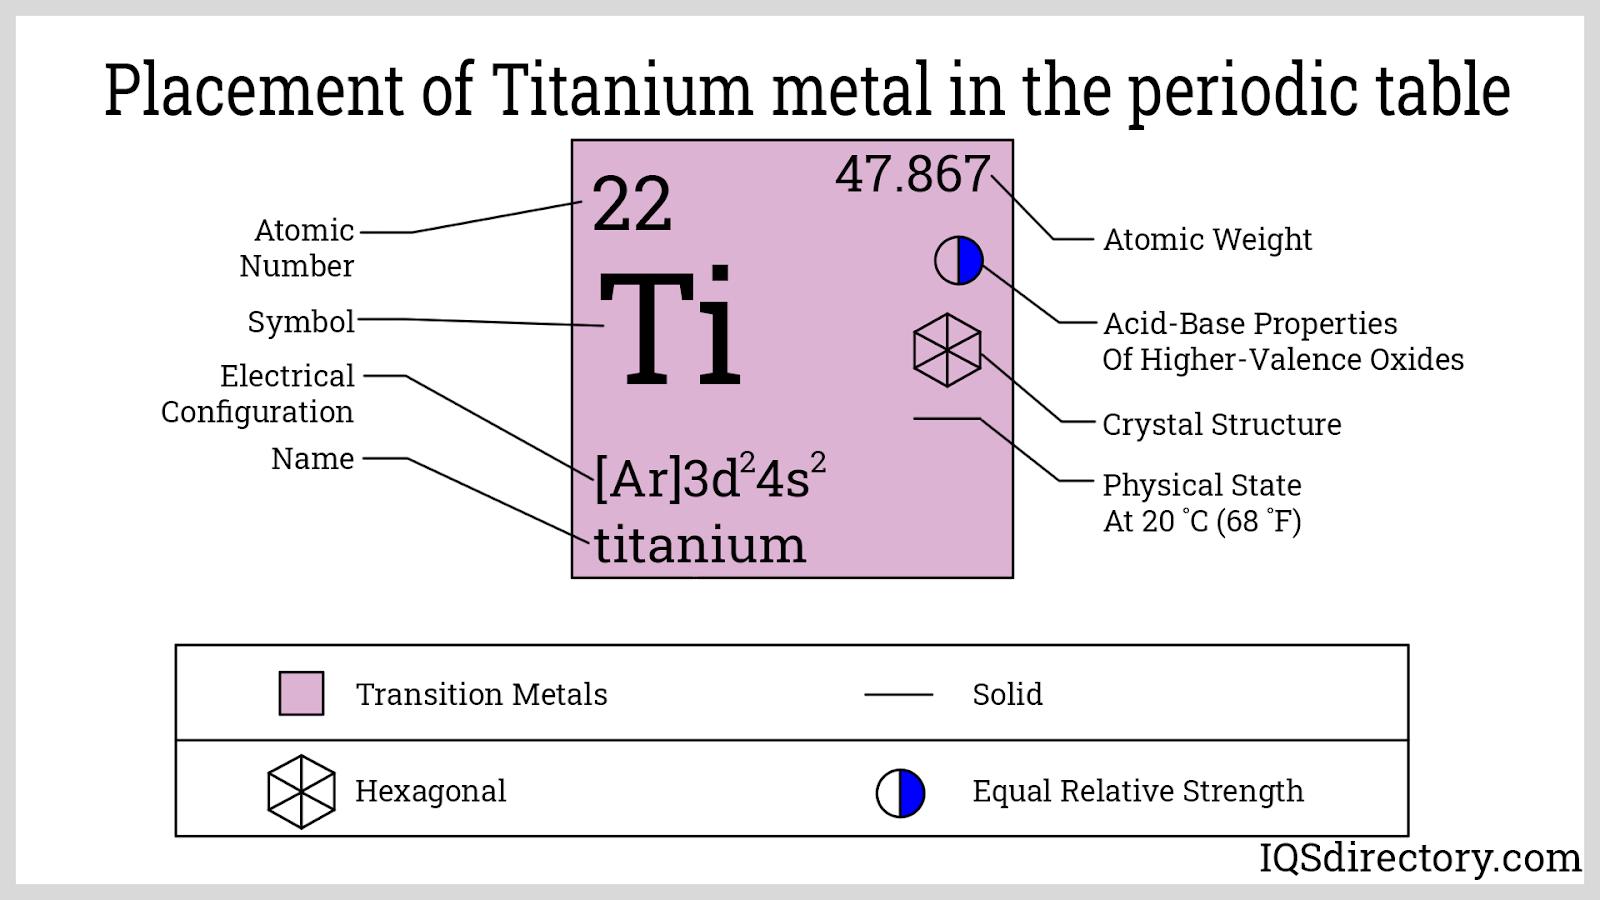 Placement of Titanium metal in the periodic table